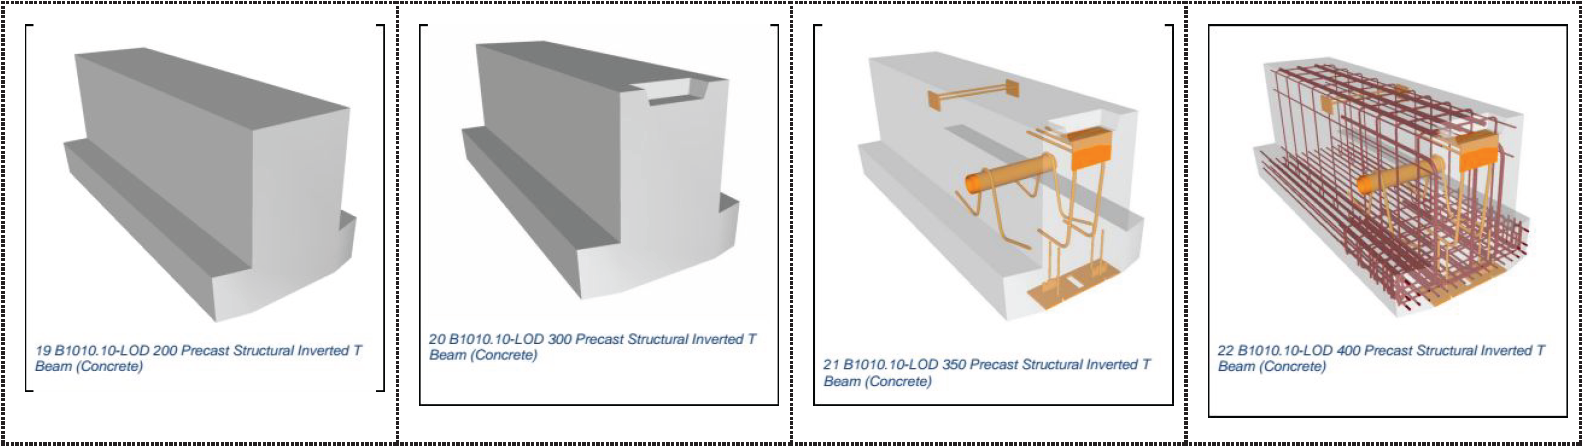 LOD - precast beam